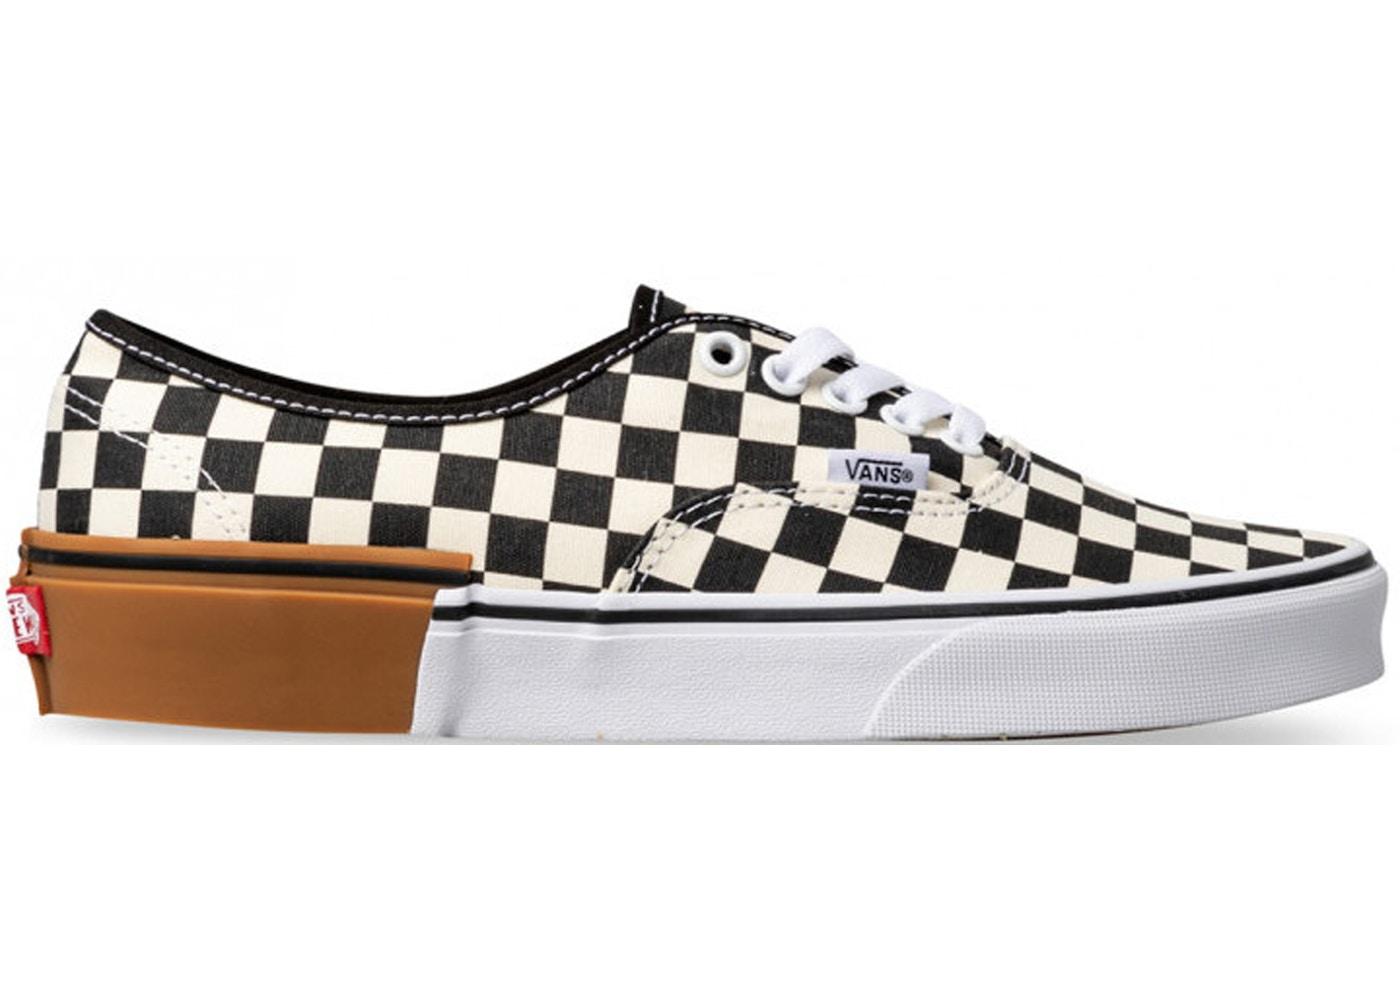 Vans Authentic Checkerboard Gum Sole - VNA38EMU58